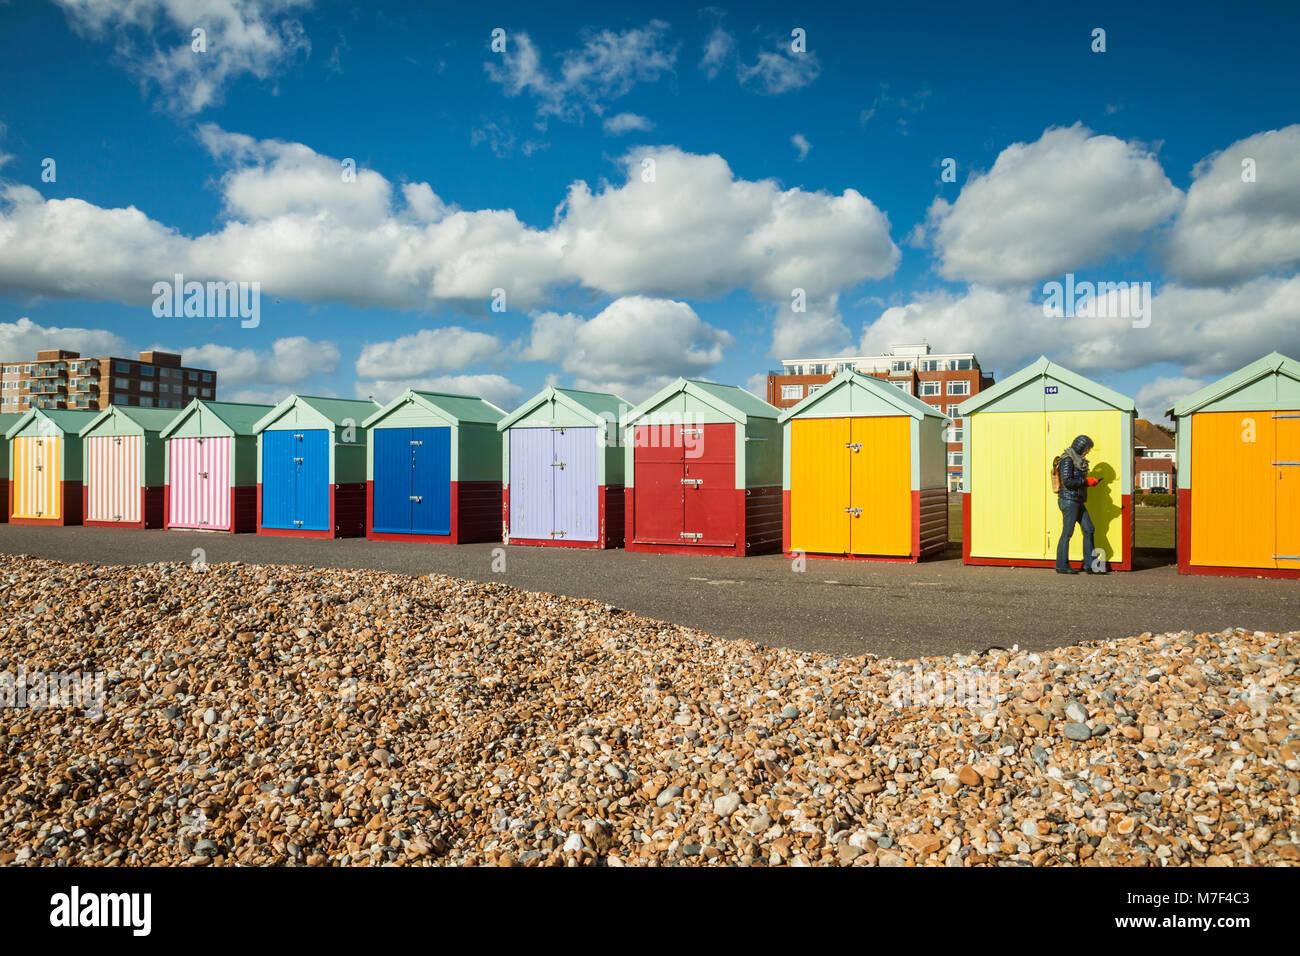 Mehrfarbige Strand Hütten auf der Strandpromenade in Hove, East Sussex, England. Stockbild